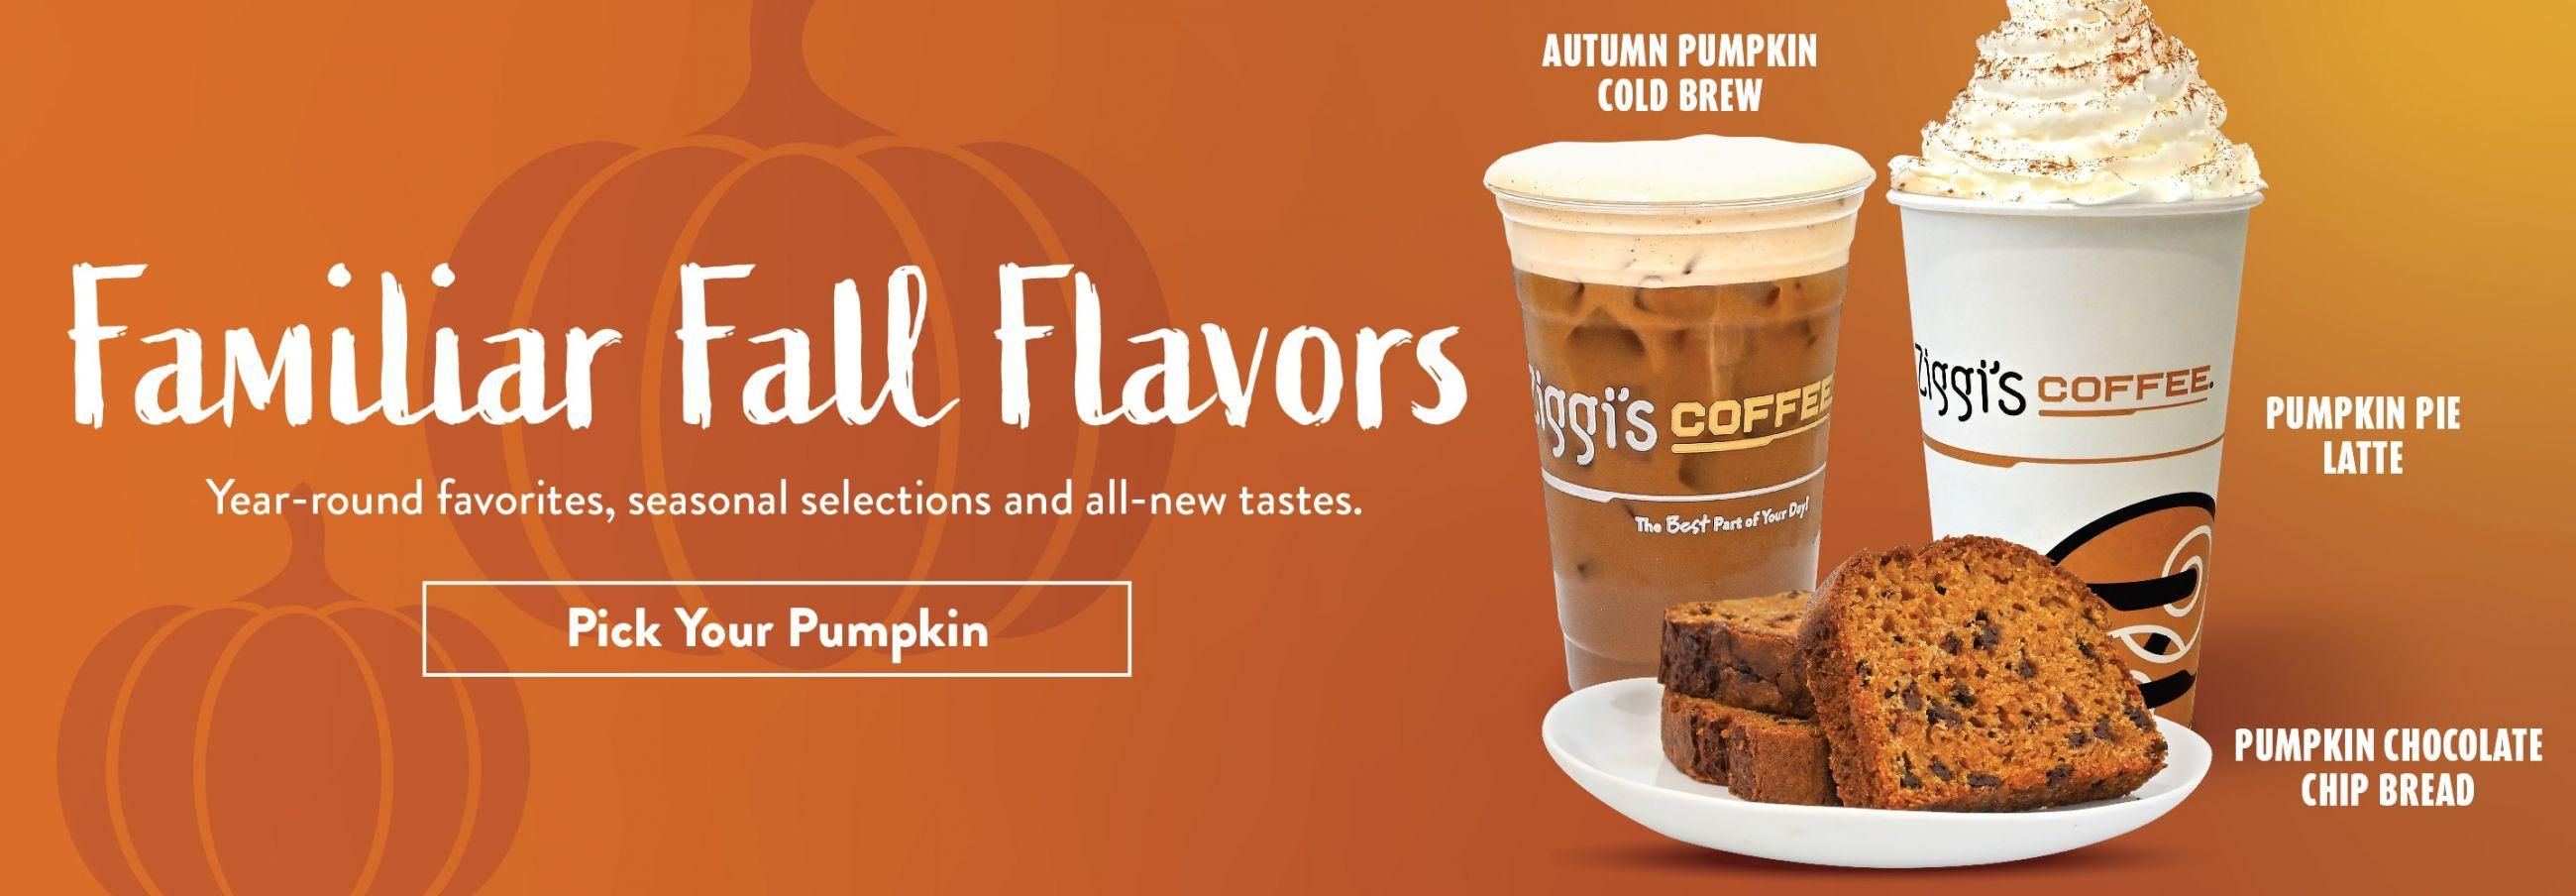 Autumn Pumpkin Cold Brew, Pumpkin Pie Latte and Pumpkin Bread available at Ziggi's Coffee